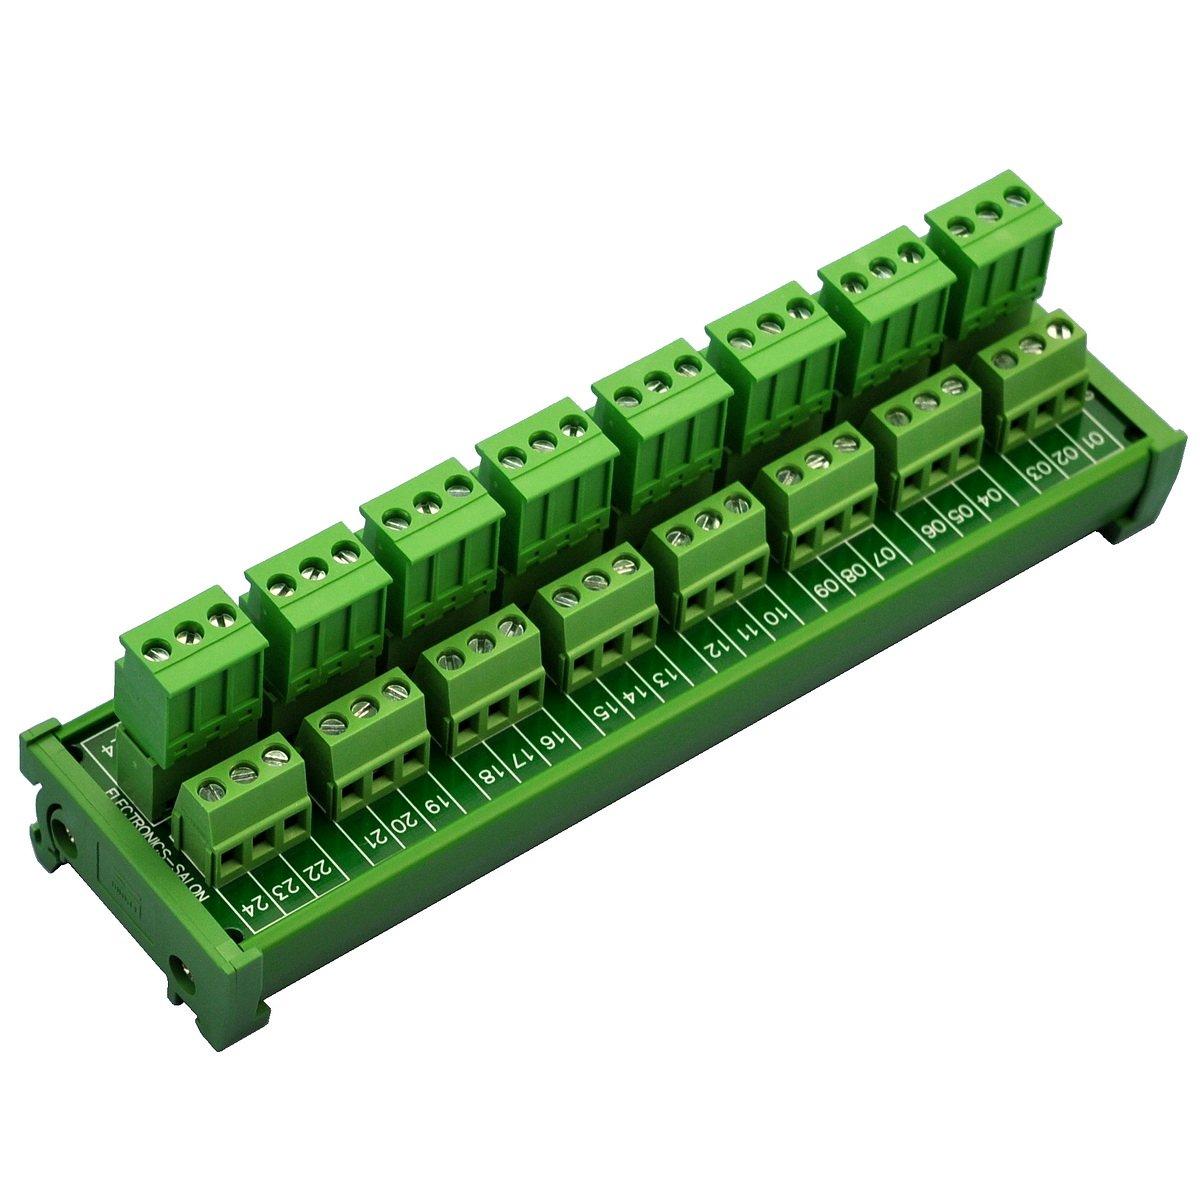 Electronics-Salon DIN Rail Mount Pluggable 8x3 Position 10A/300V Screw Terminal Block Distribution Module. (Side Wire Connects)